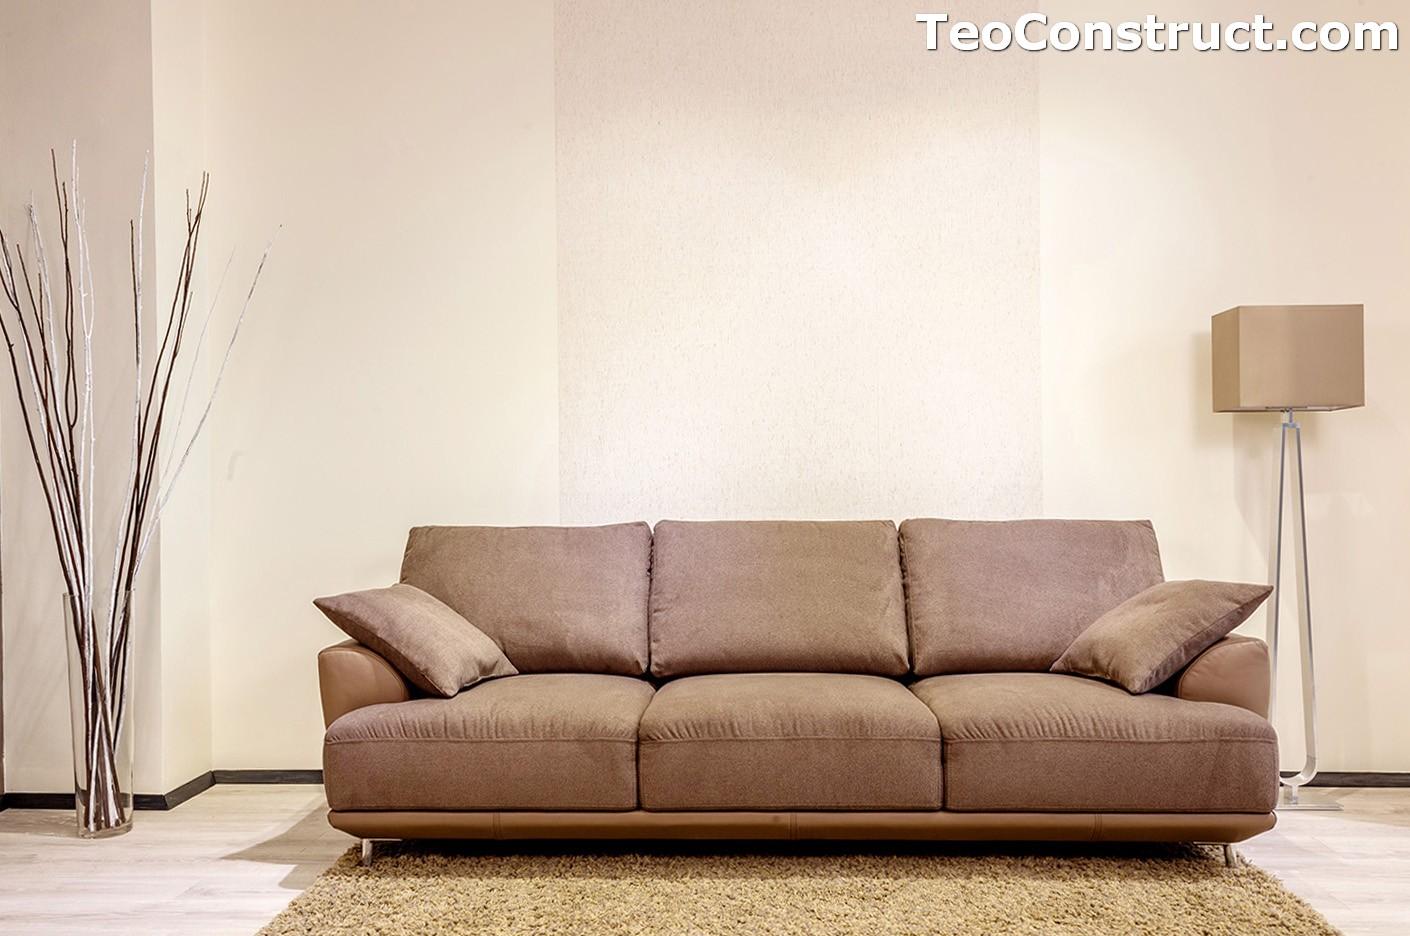 Canapea extensibila Boston pentru casa 3